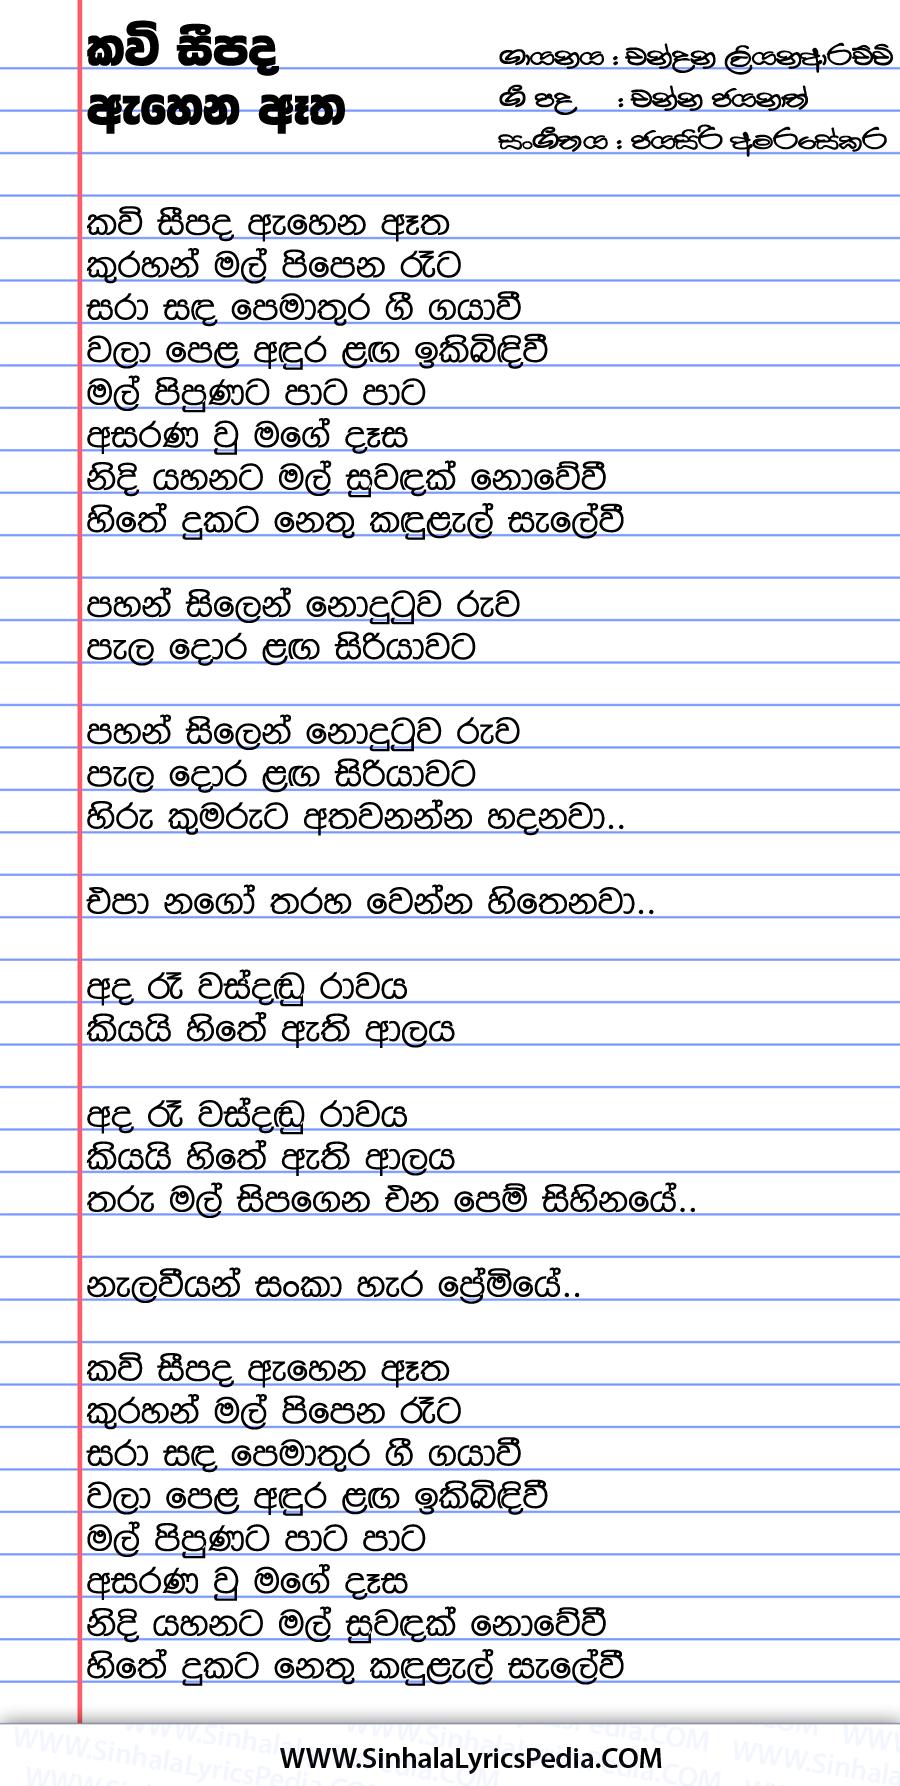 Kavi Seepada Ahena Rata Song Lyrics